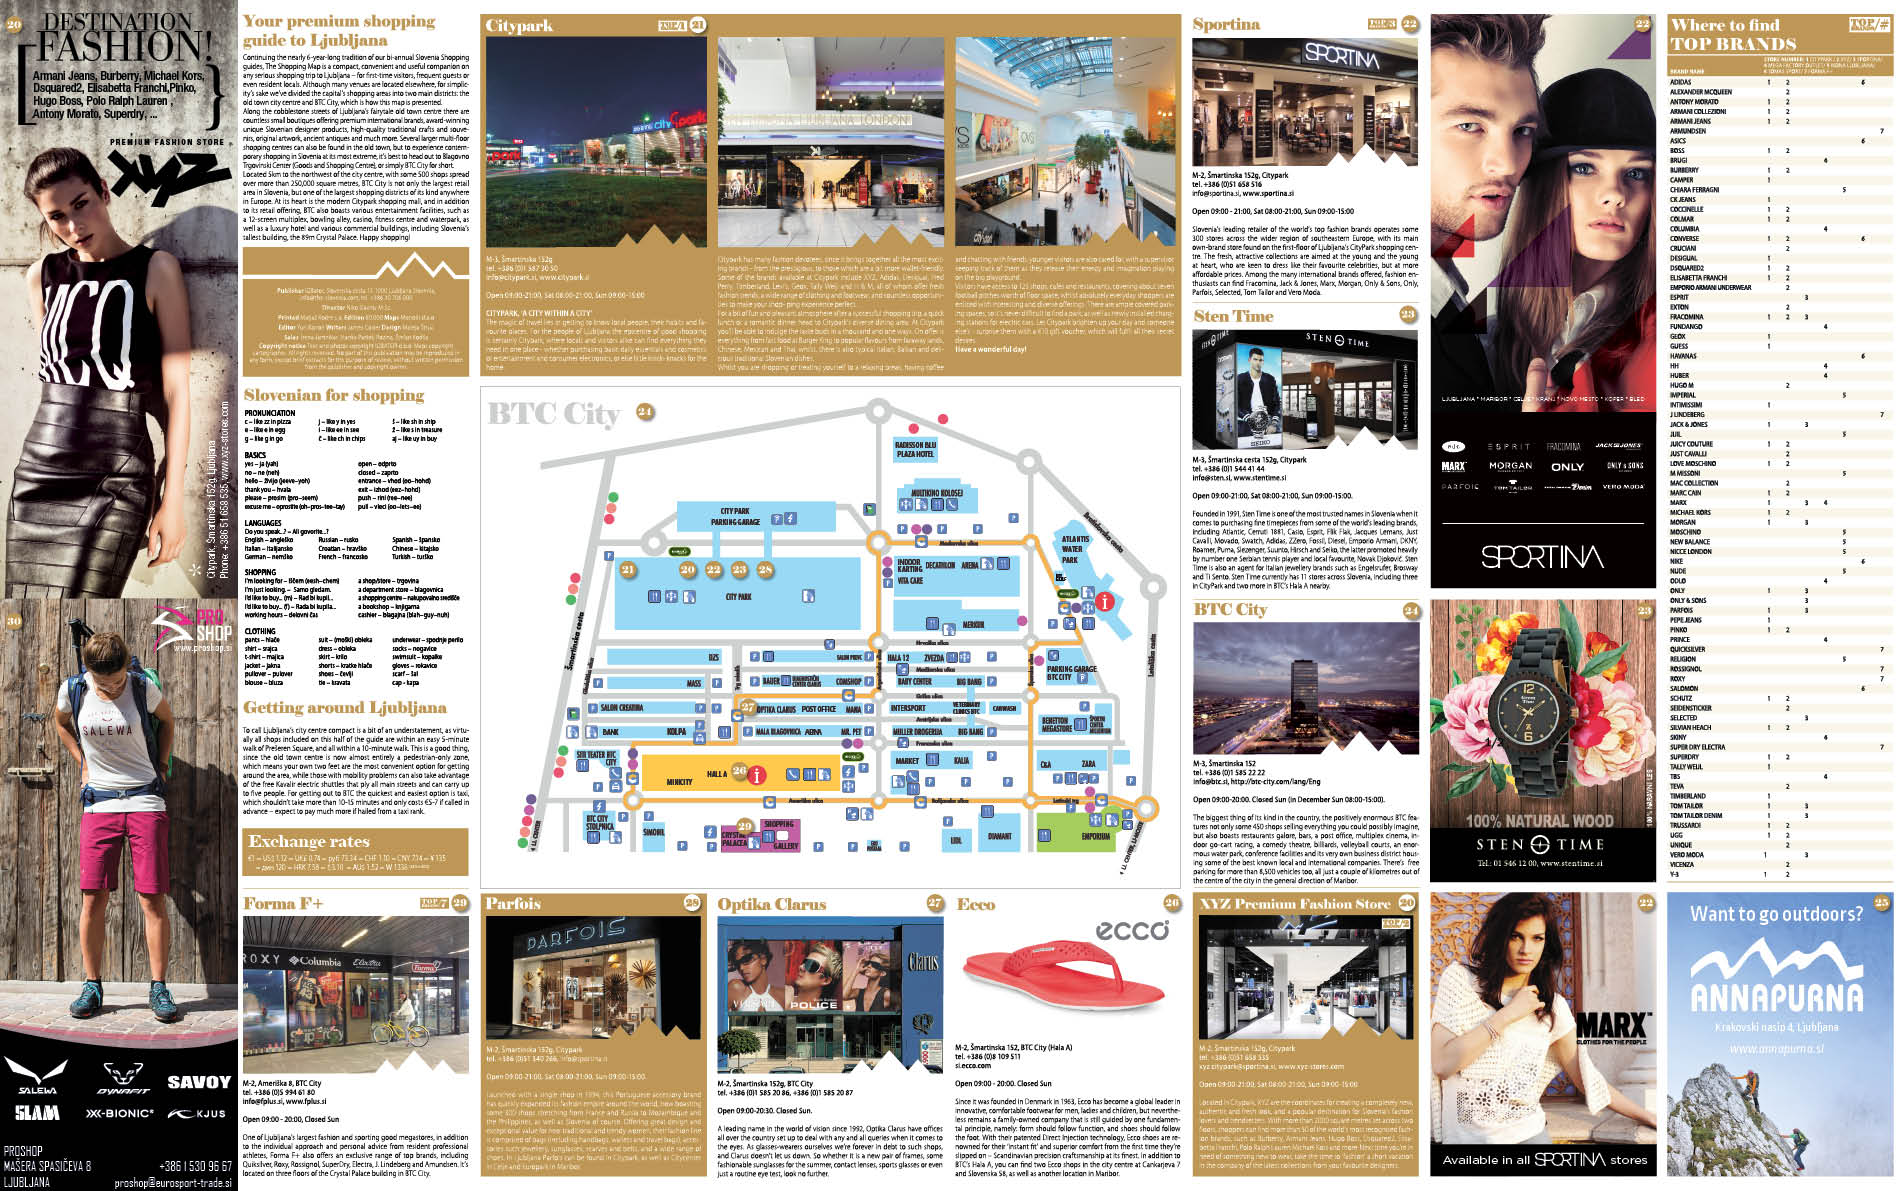 ljubljana-shopping-map2.jpg